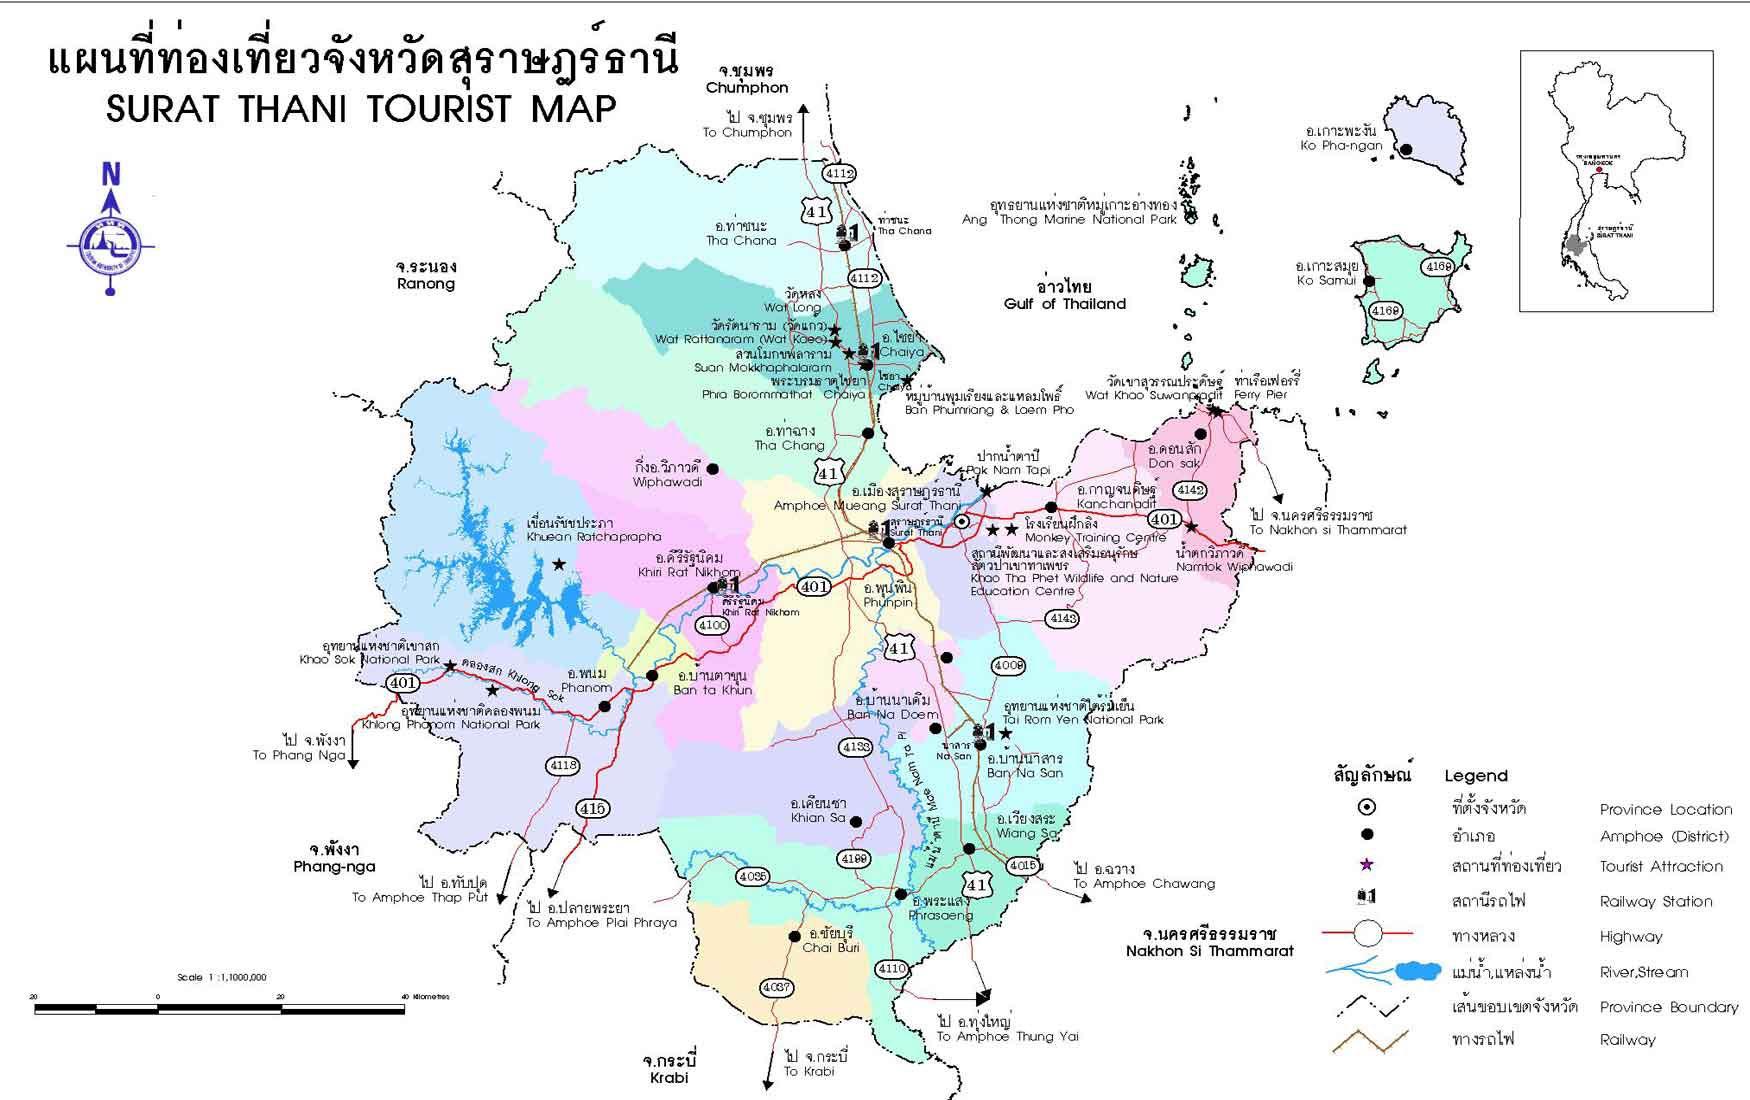 Carte Thailande Format A4.Cartes De Thailande Cartes Typographiques Detaillees Des